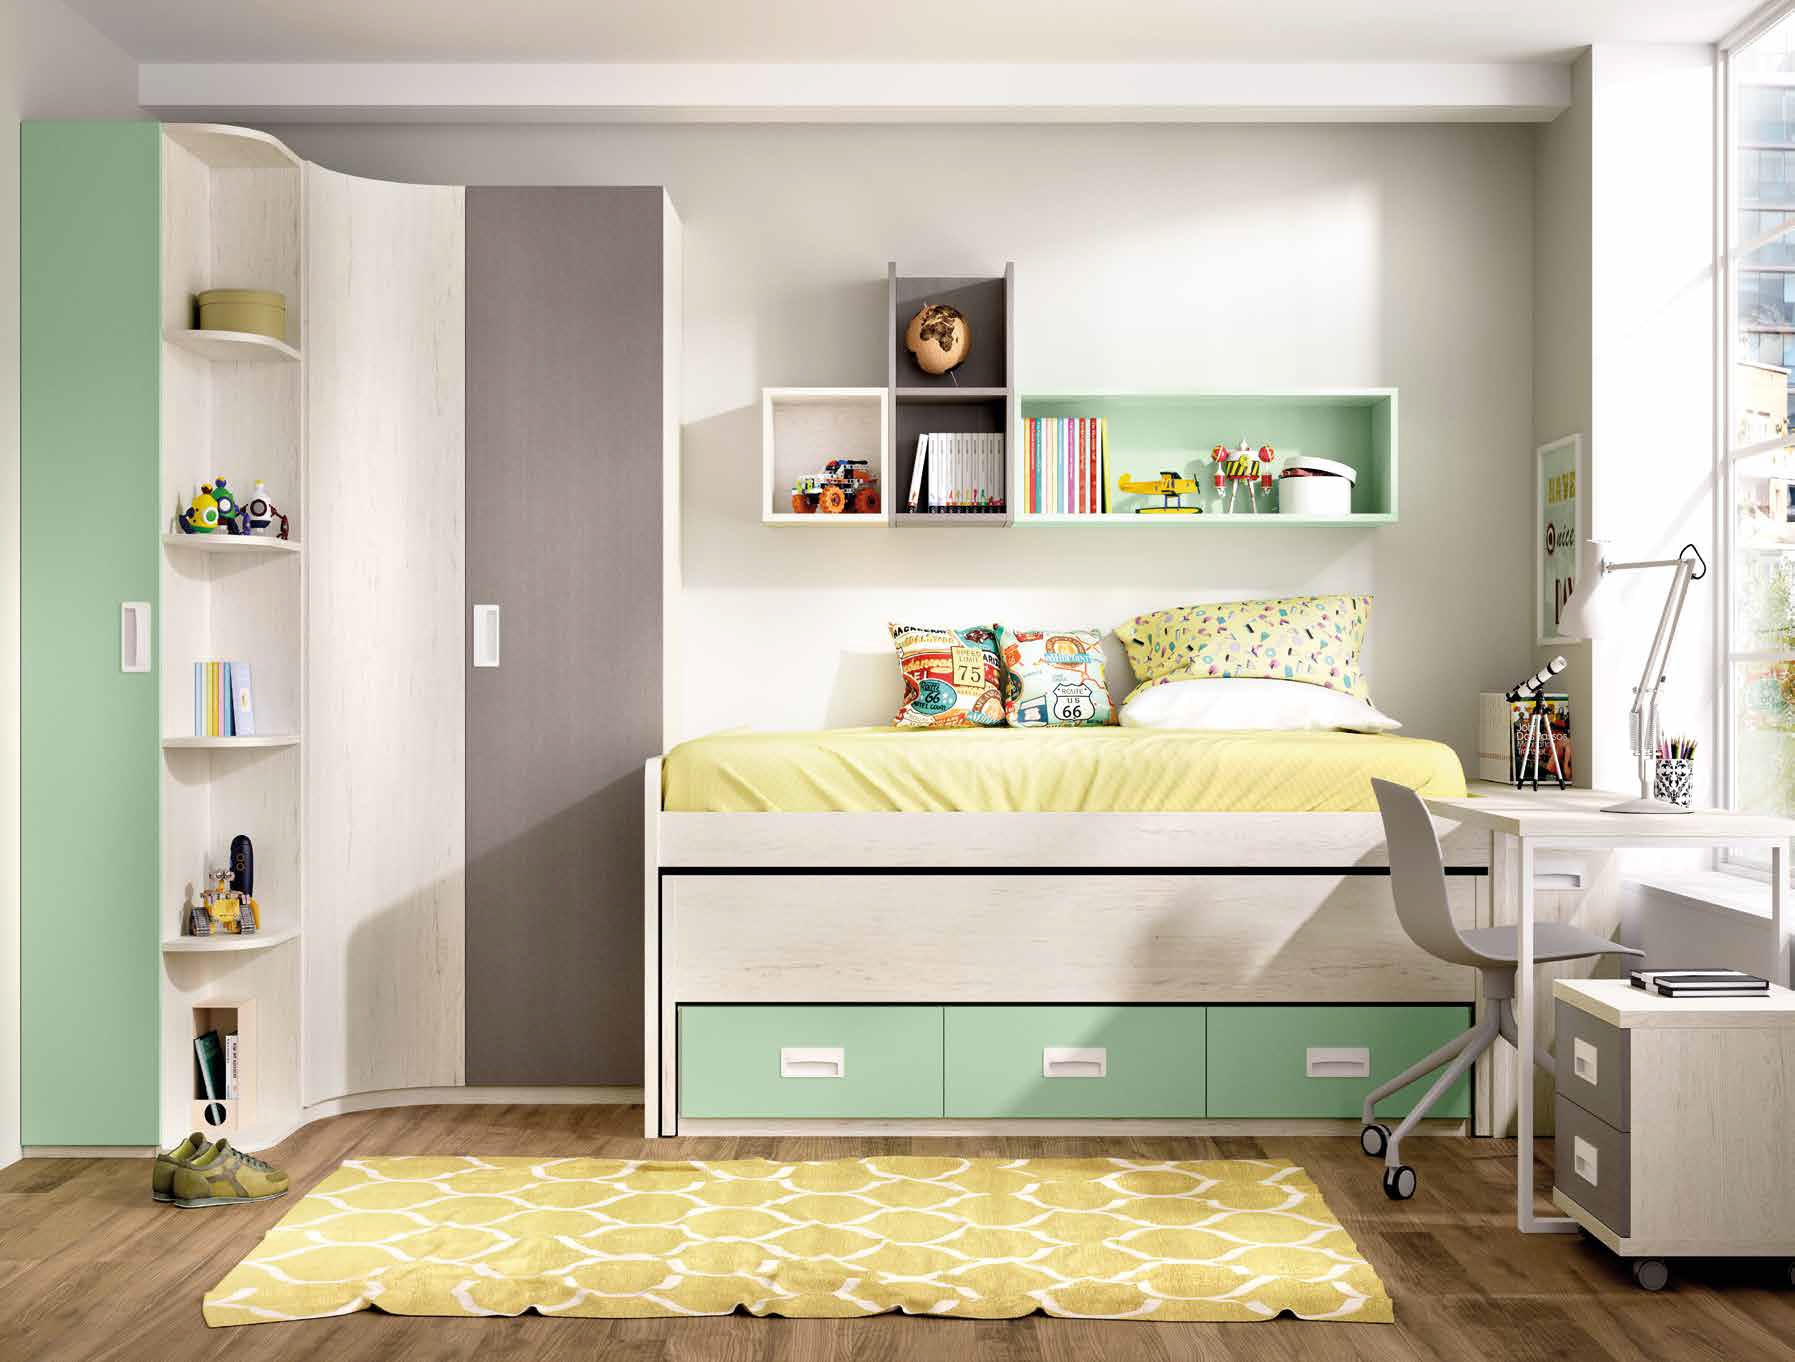 compactos-ONE-19-muebles-paco-caballero-512-5ccc174766e62